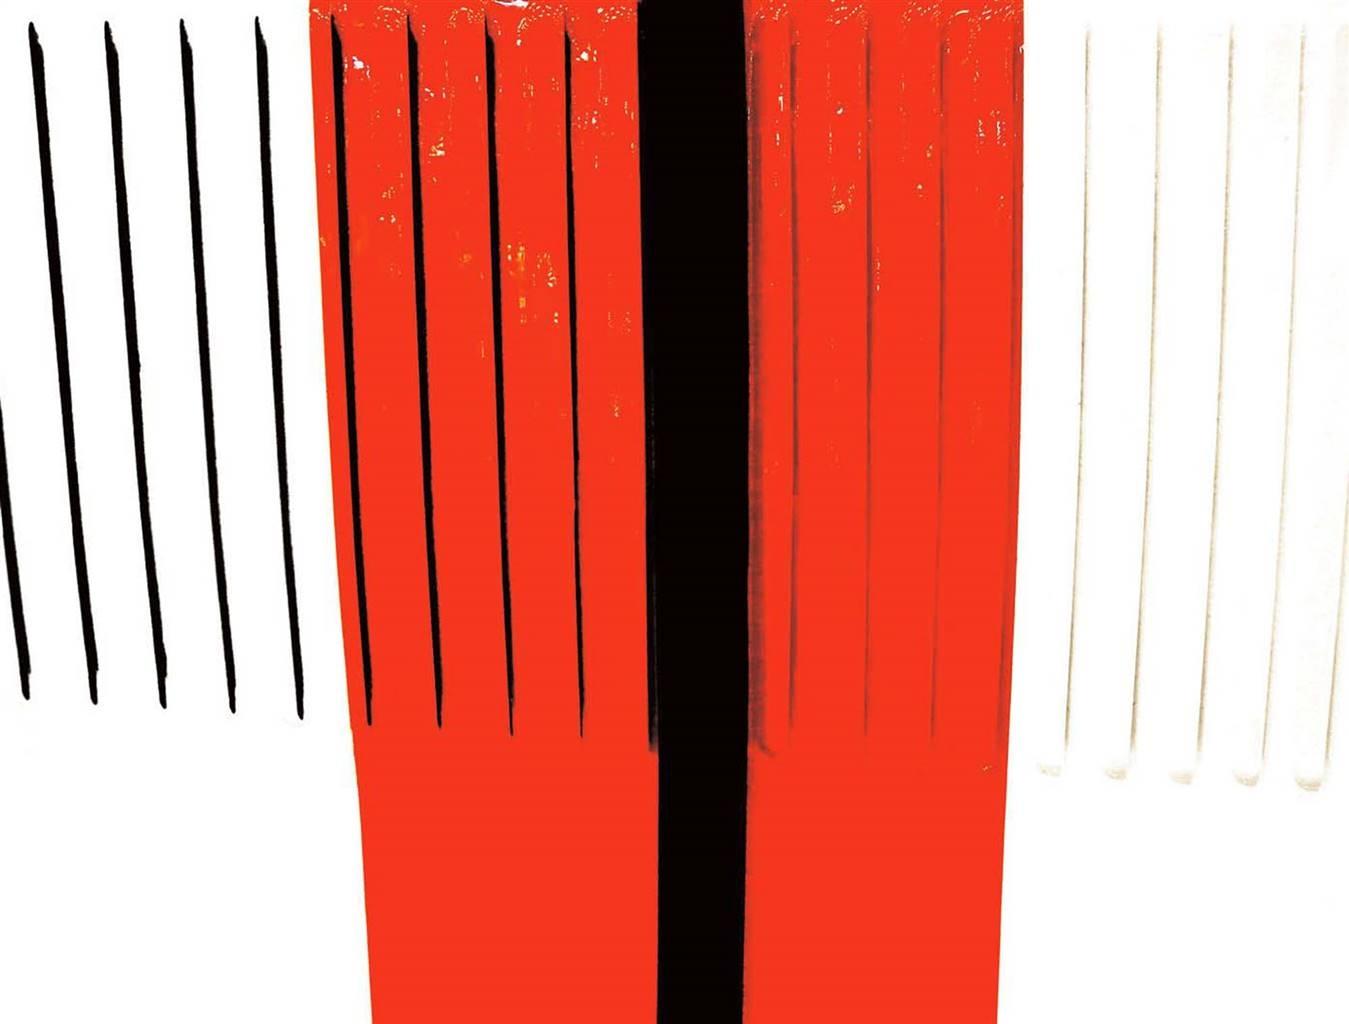 Marco Carnaroli, #001 Morgan White & Red - Air Series,Inkjet Print on Hahnemühle Paper, 45''x59'' image